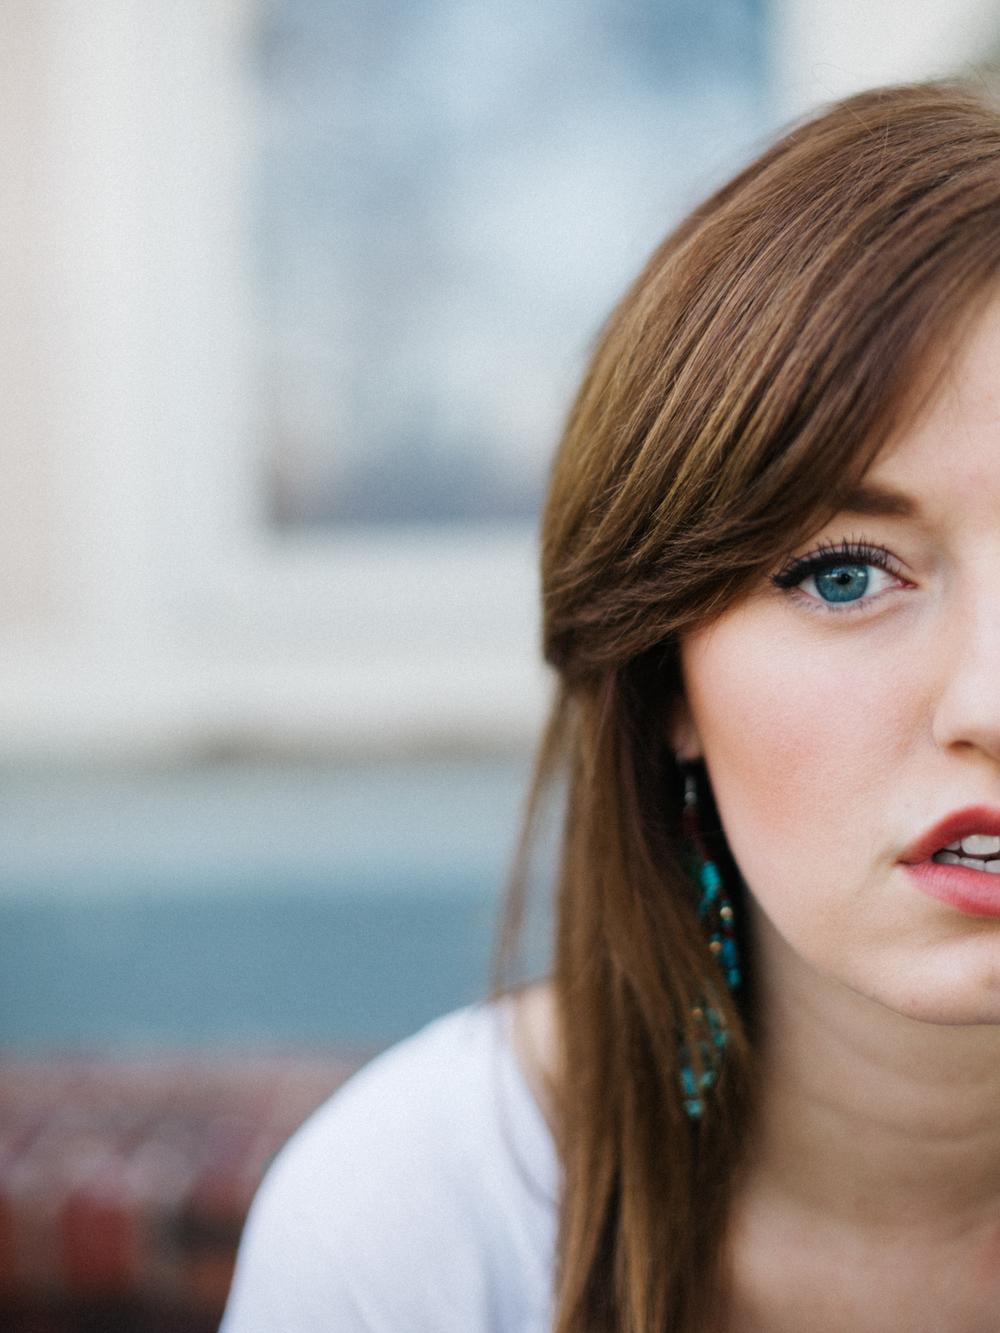 Alexis-Neal Dieker-Portrait Photographer-Wichita, KS-113.jpg